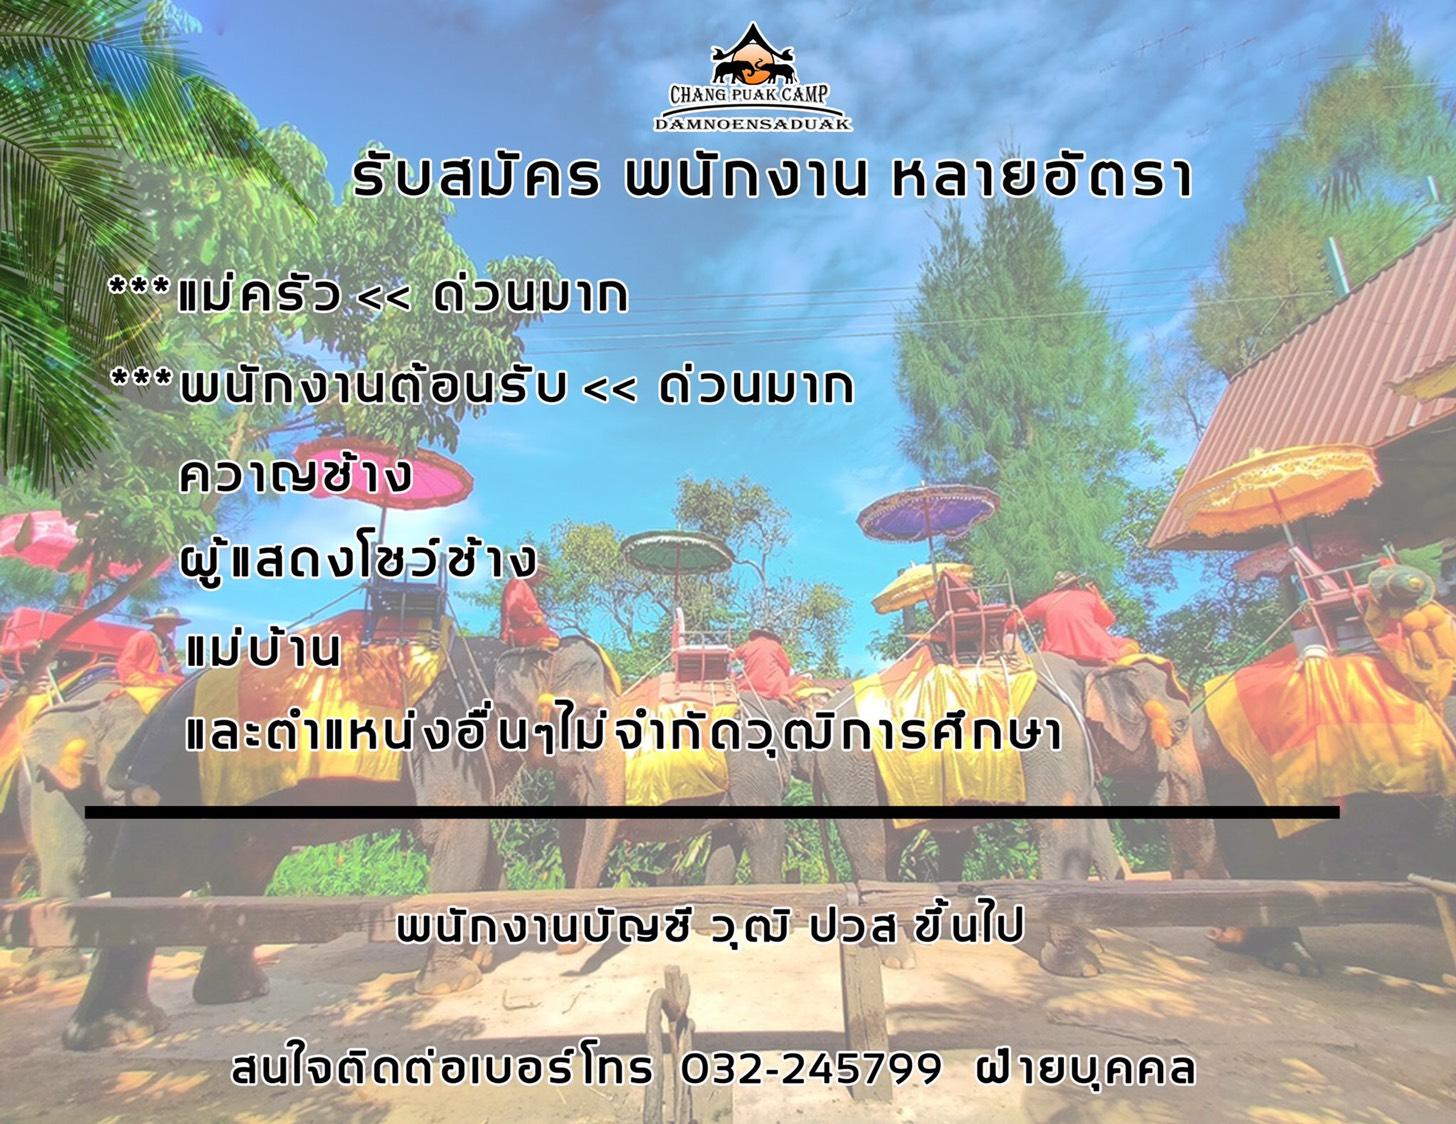 S__11763750-1